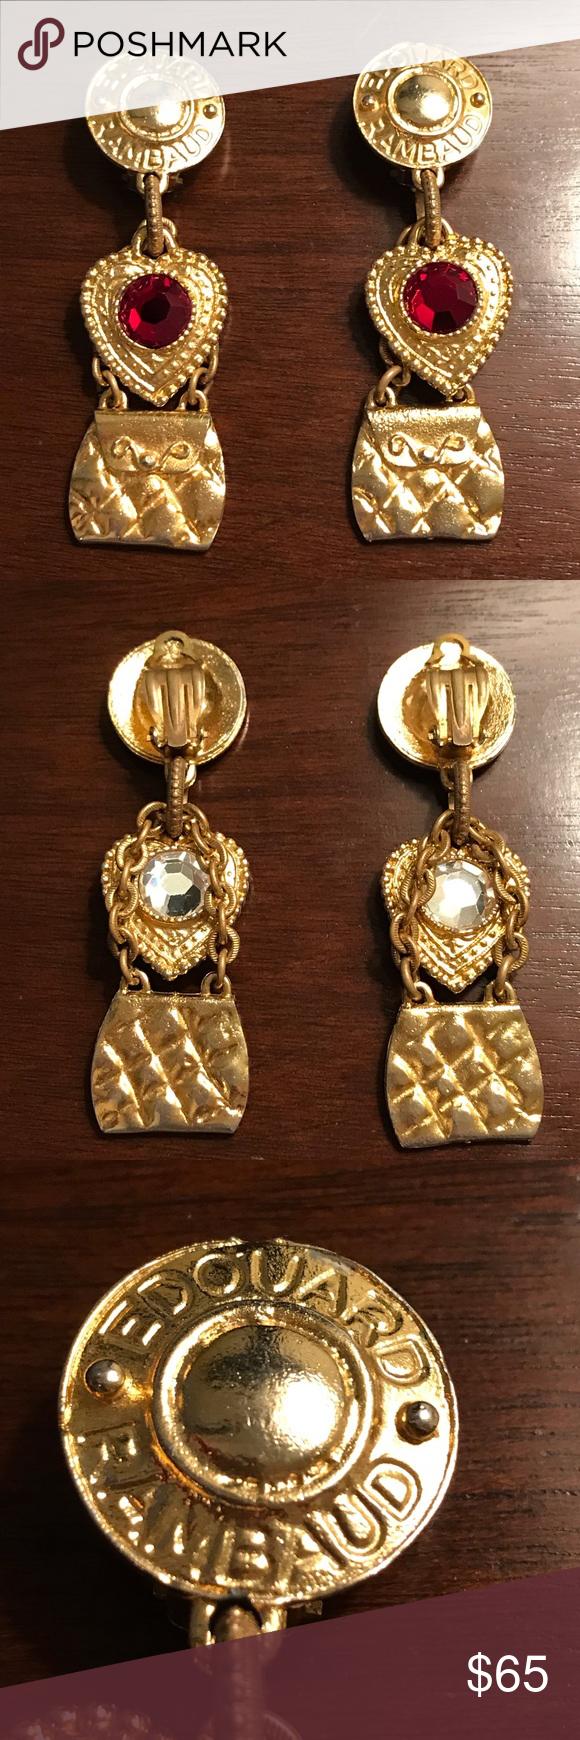 Clip on earrings gold tone vintage accessory Edouard Rambaud Paris